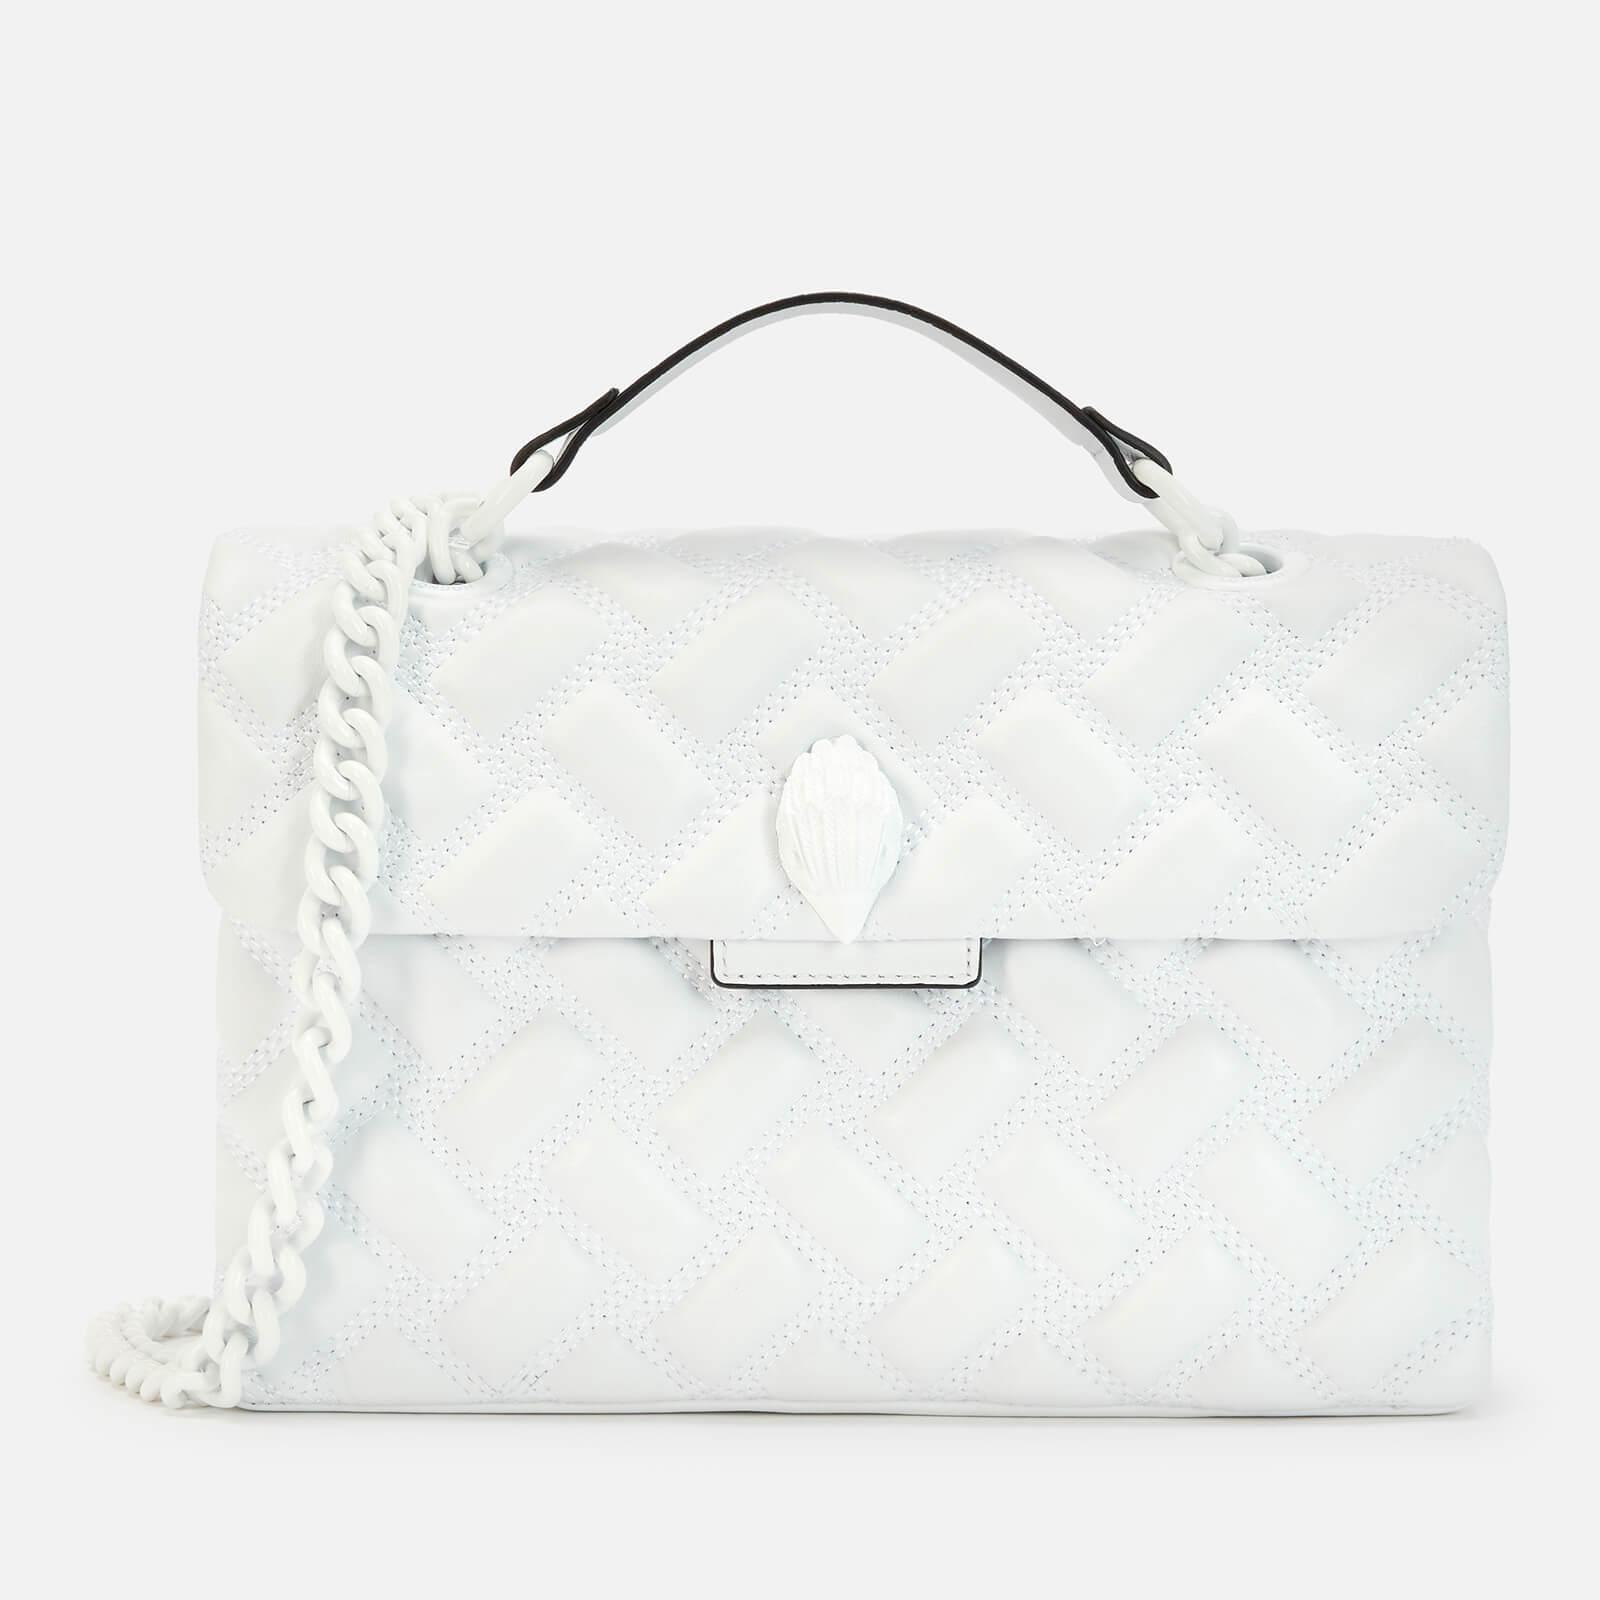 Kurt Geiger London Women's Kensington Drench Bag - White